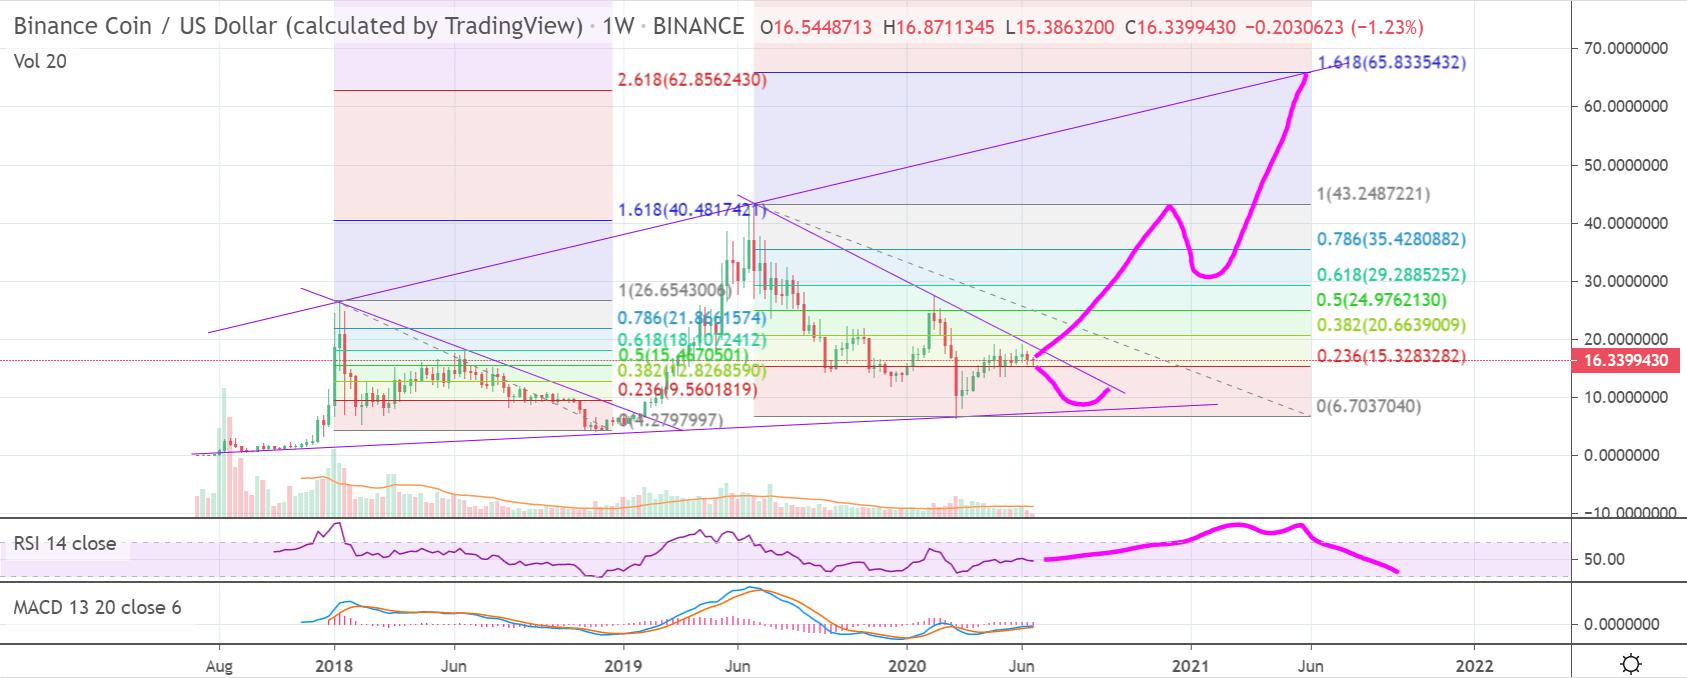 Binance Coin price chart 2 - 16 June